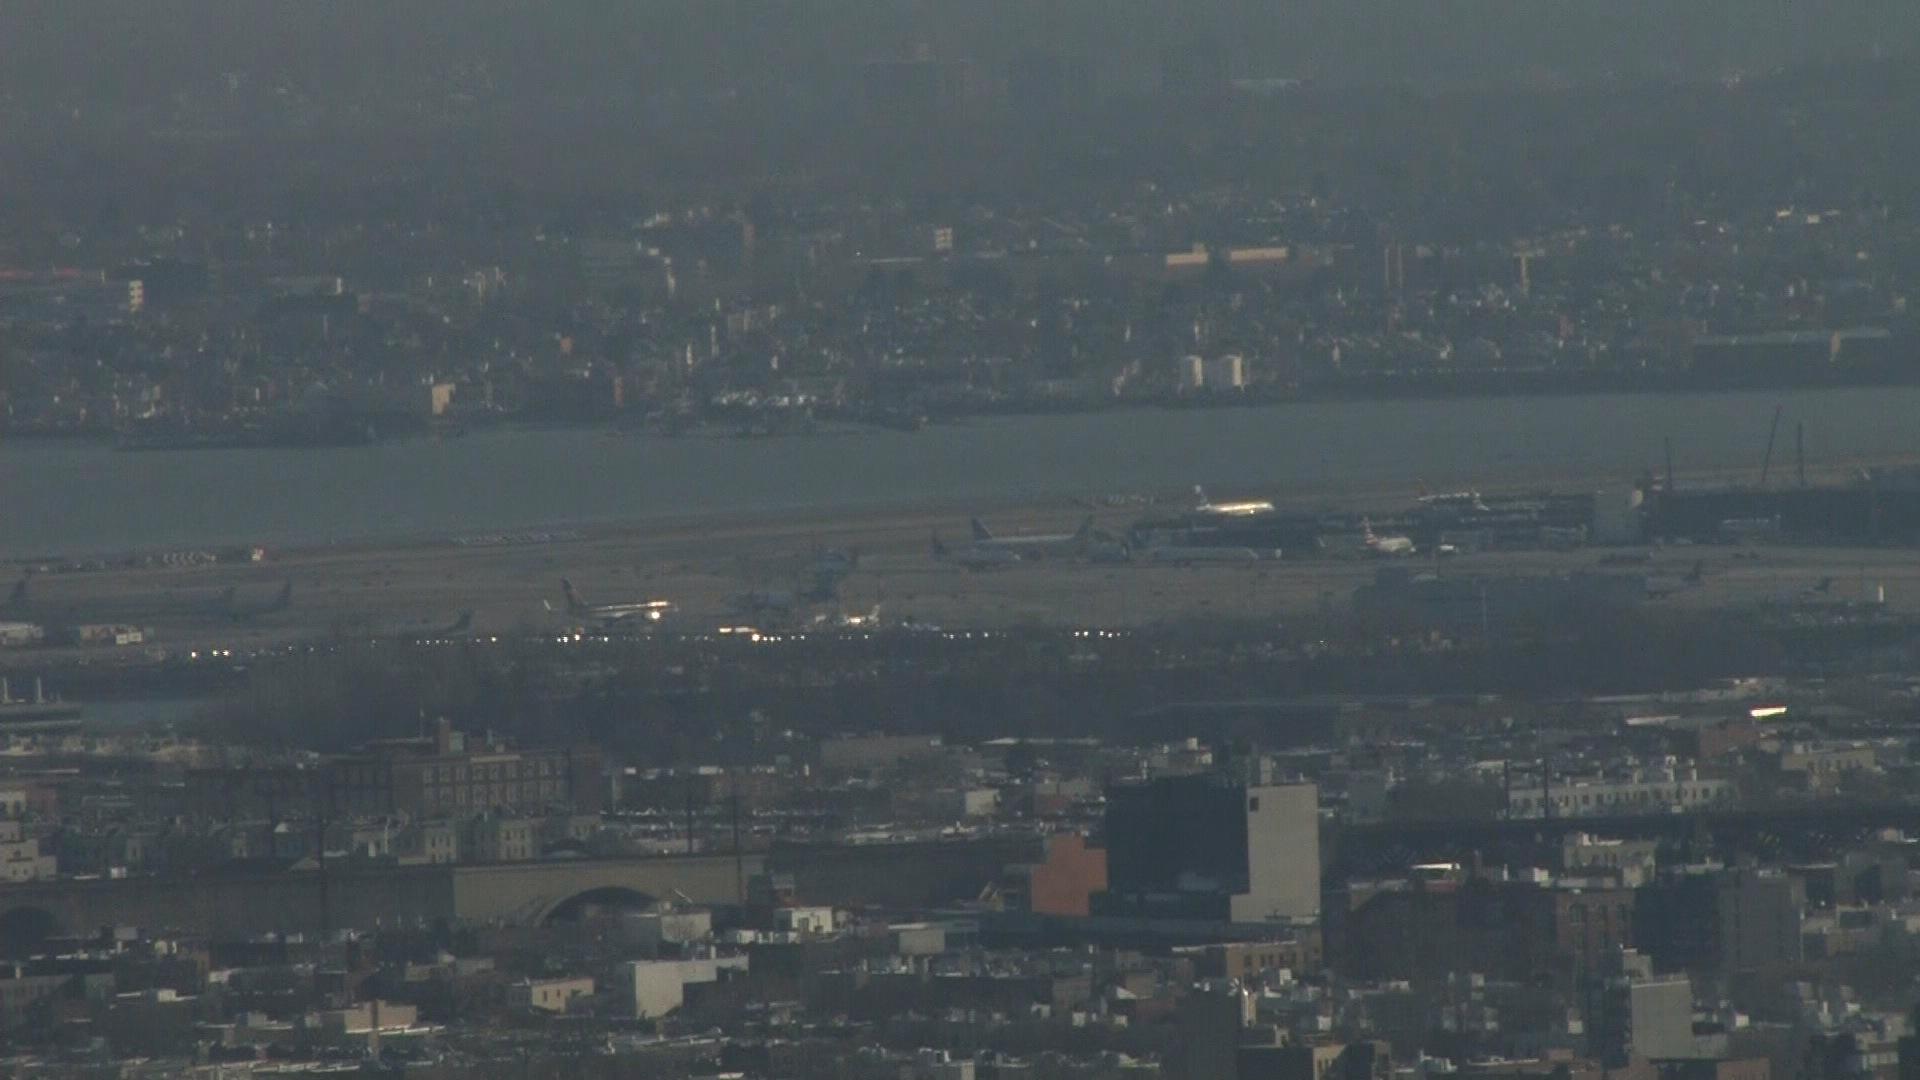 FAA orders ground stop at LaGuardia amid massive delays